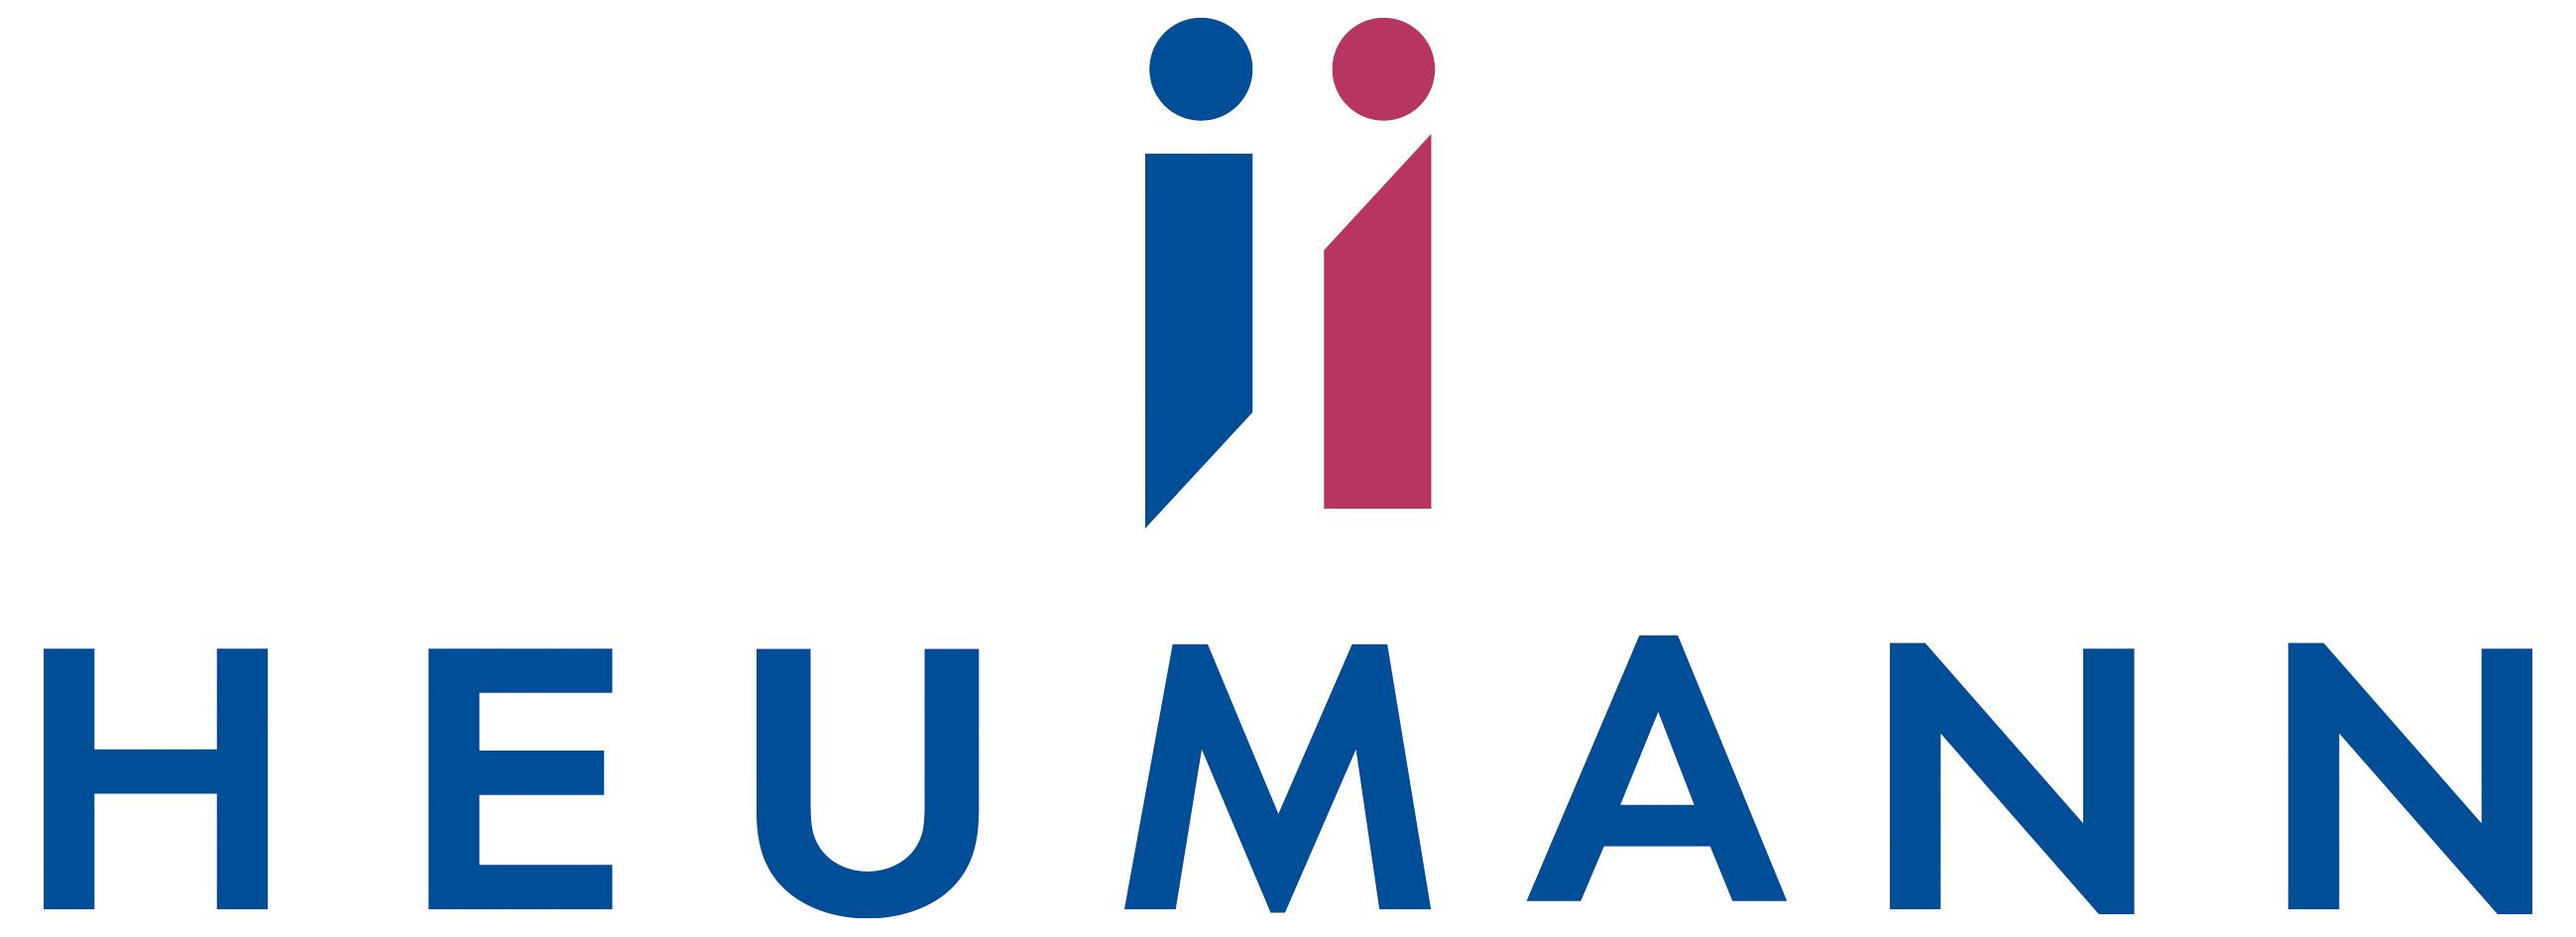 HEUMANN PHARMA GmbH & Co. Generica KG